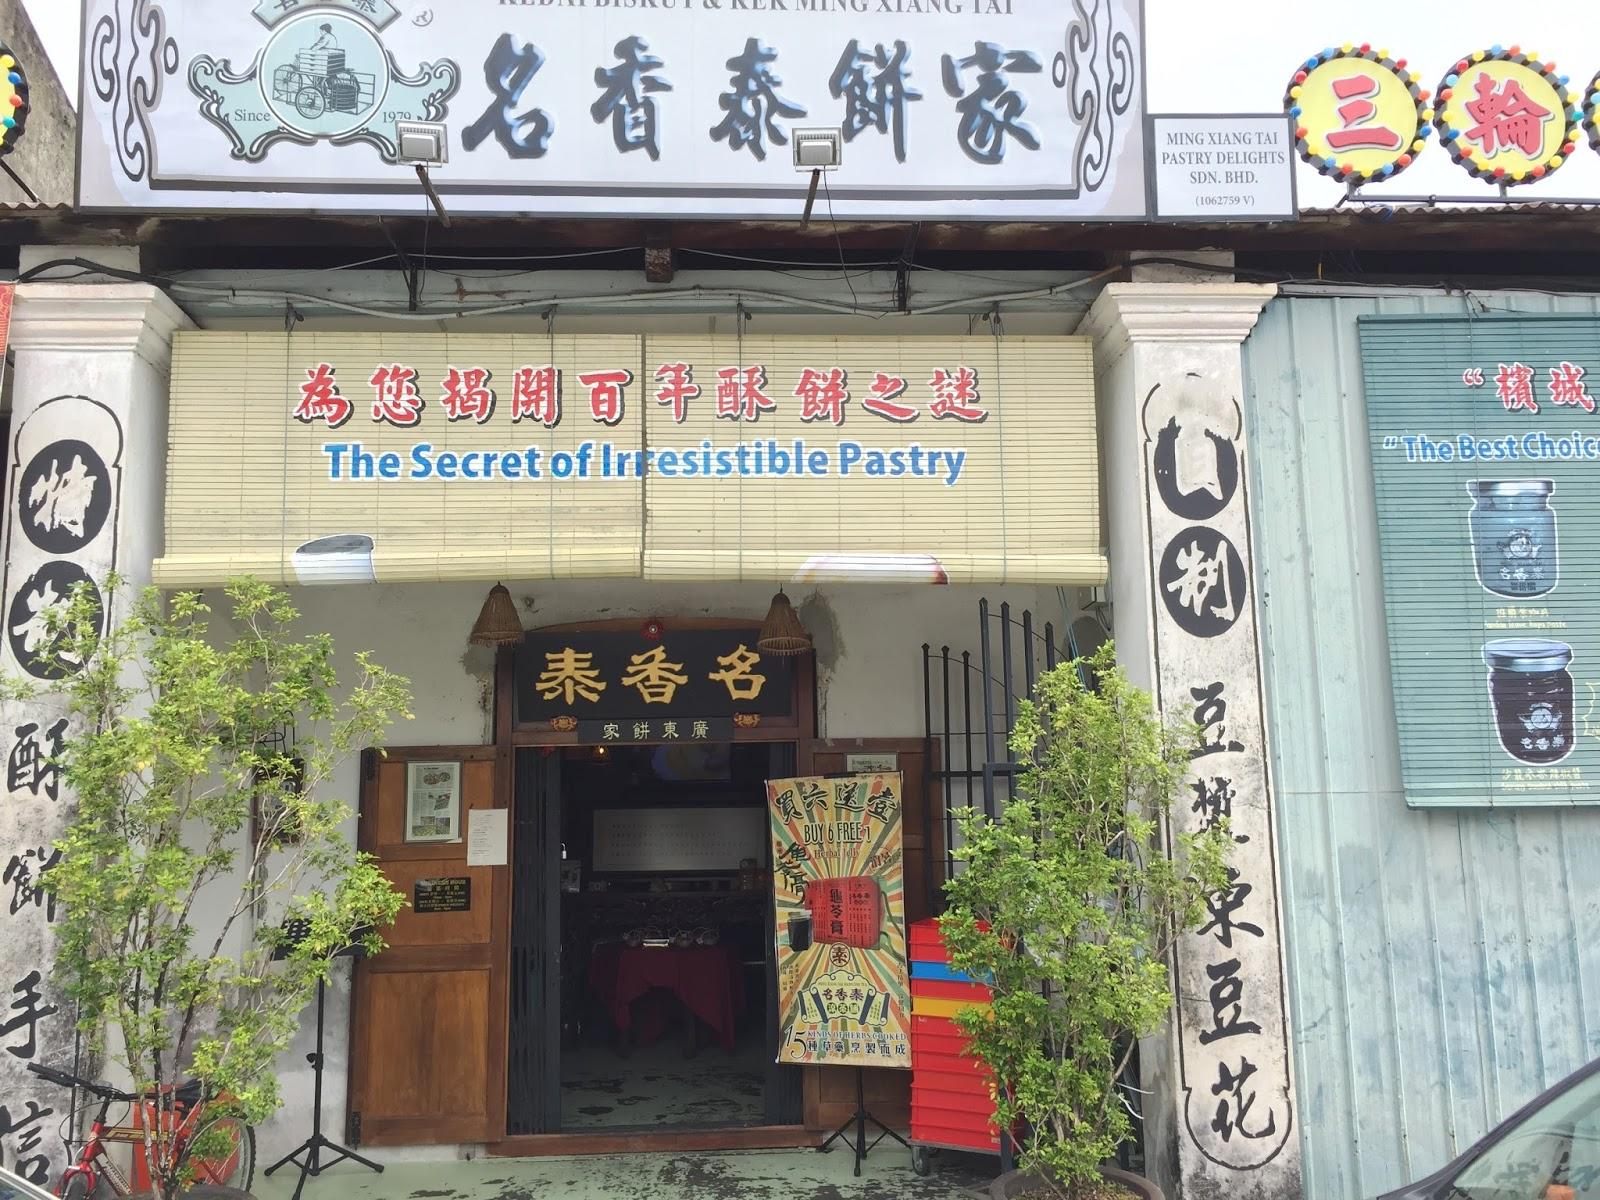 Penang - Ming Xiang Tai Pastry Shop (名香泰餅家)